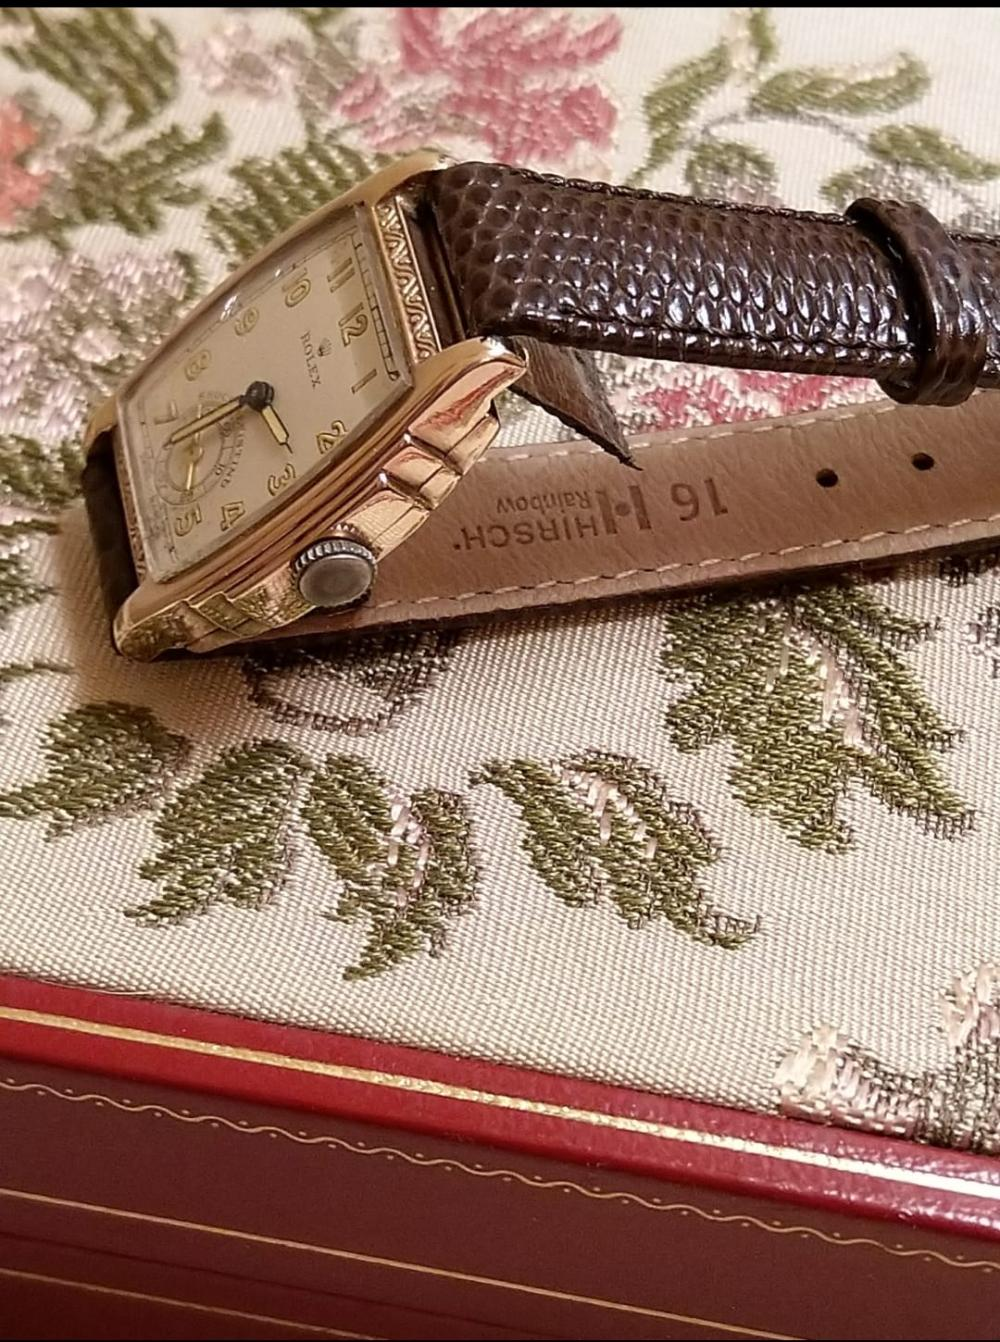 A Rolex 9kt 1940's Art Deco Ladies Wristwatch, A/F